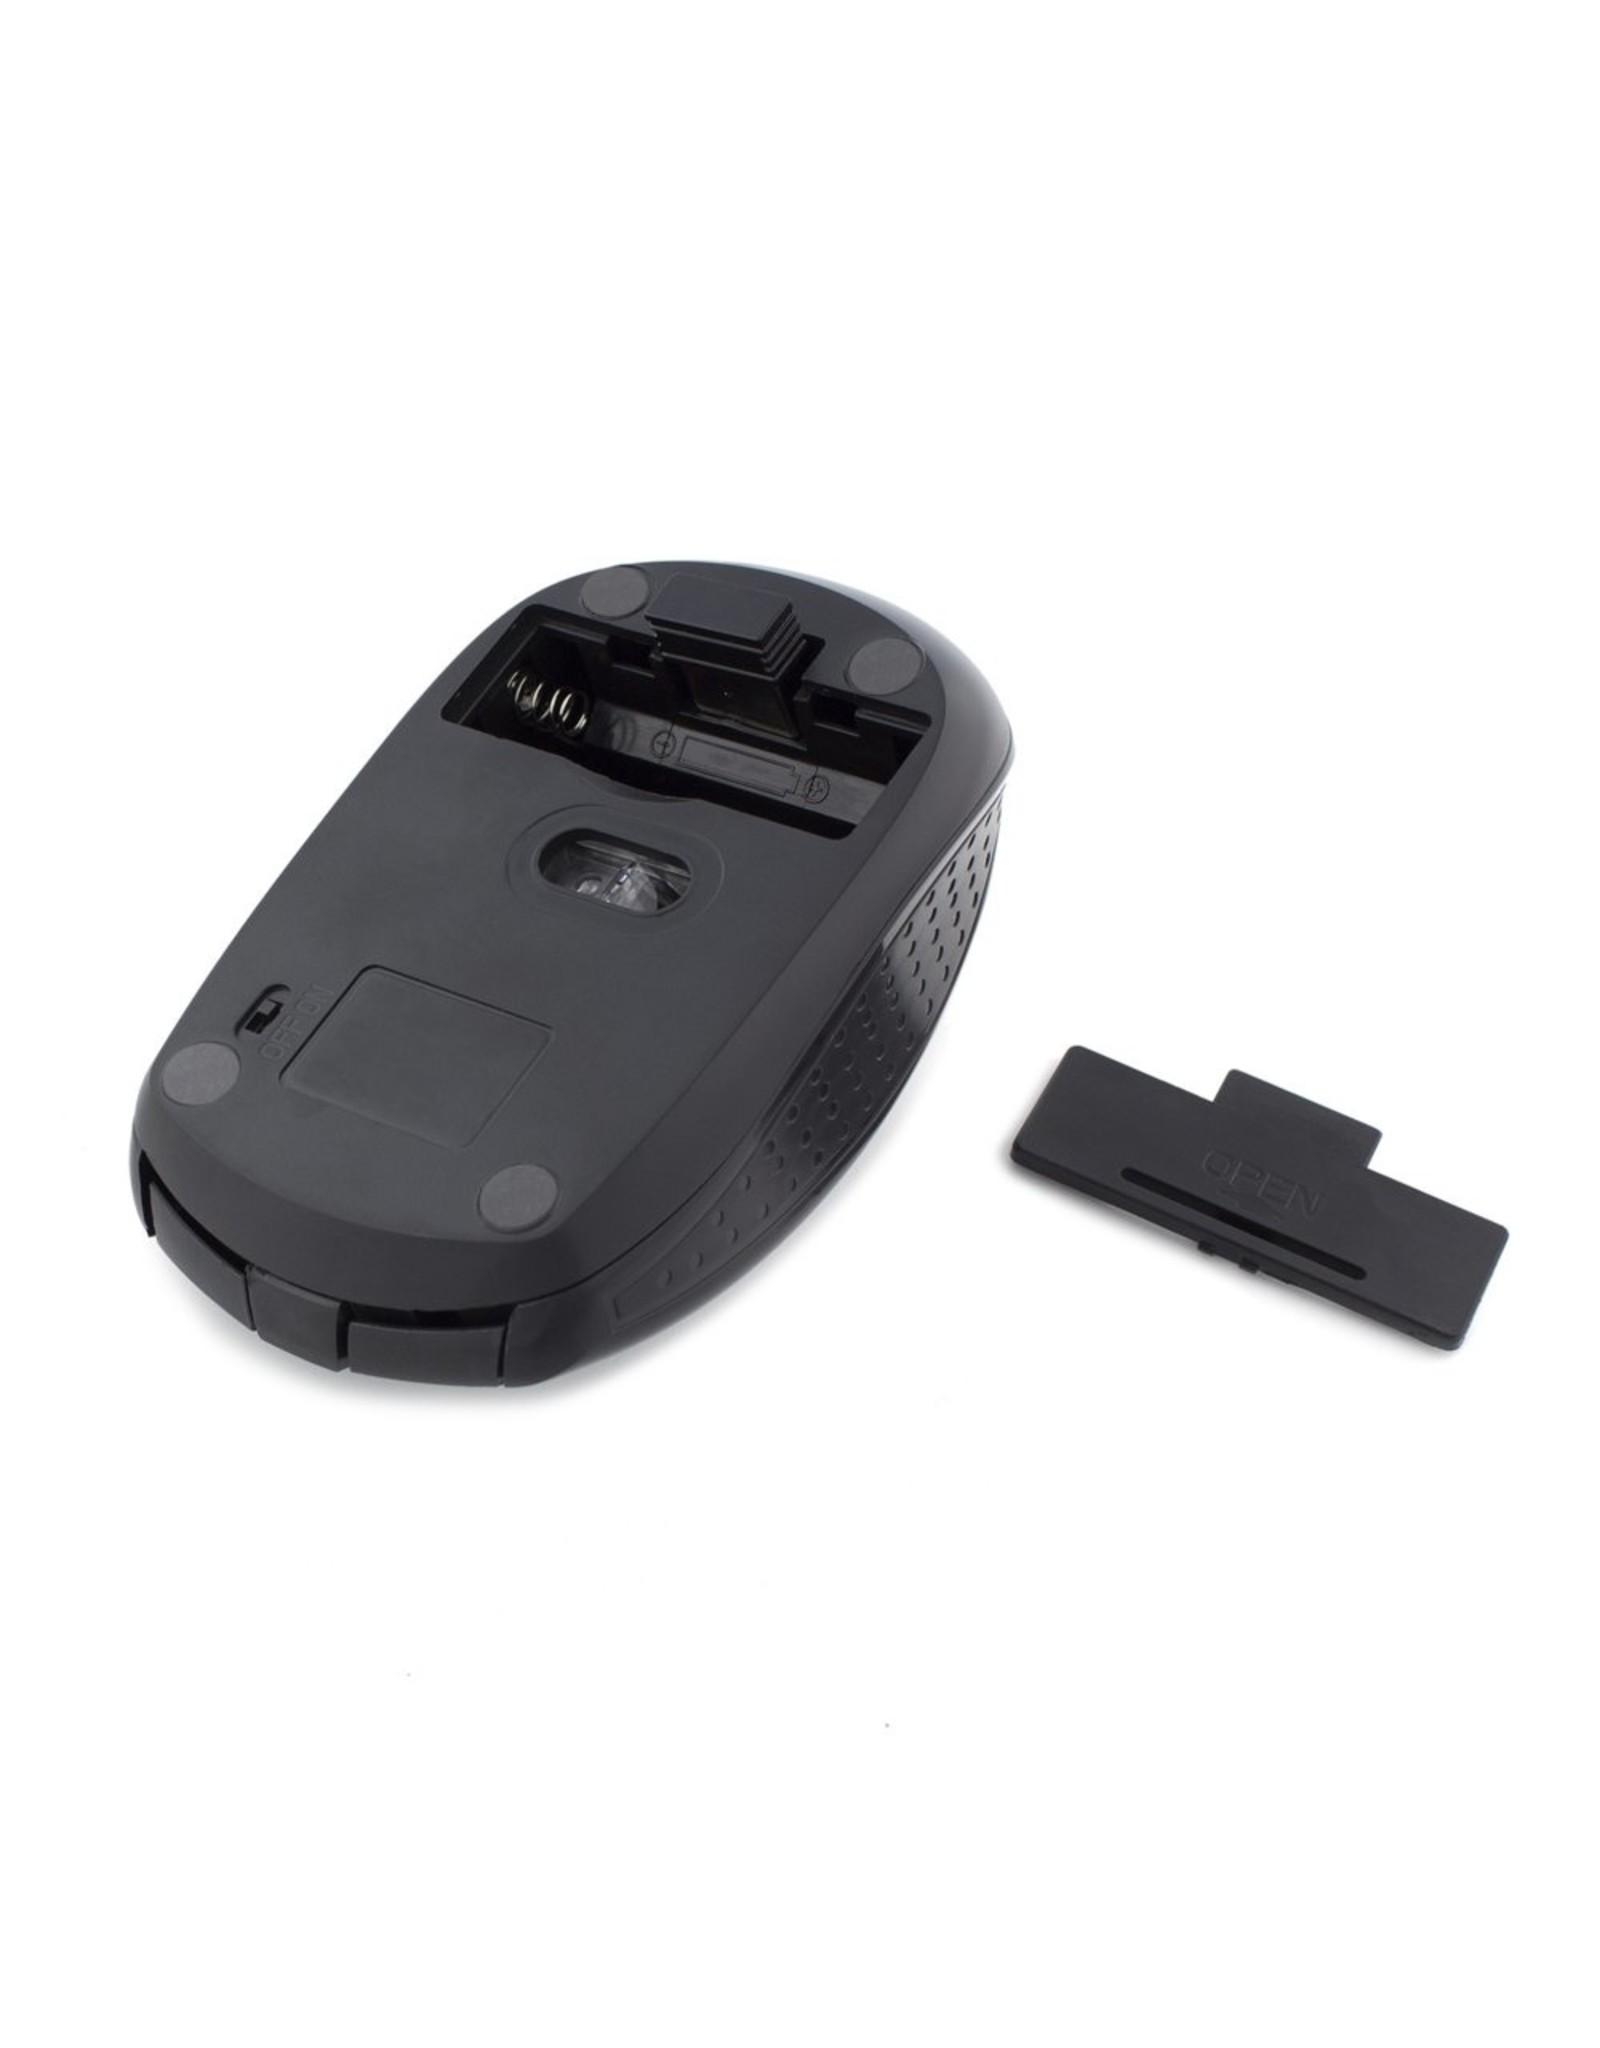 Ewent Wireless mouse black 1000/1200/1600dpi